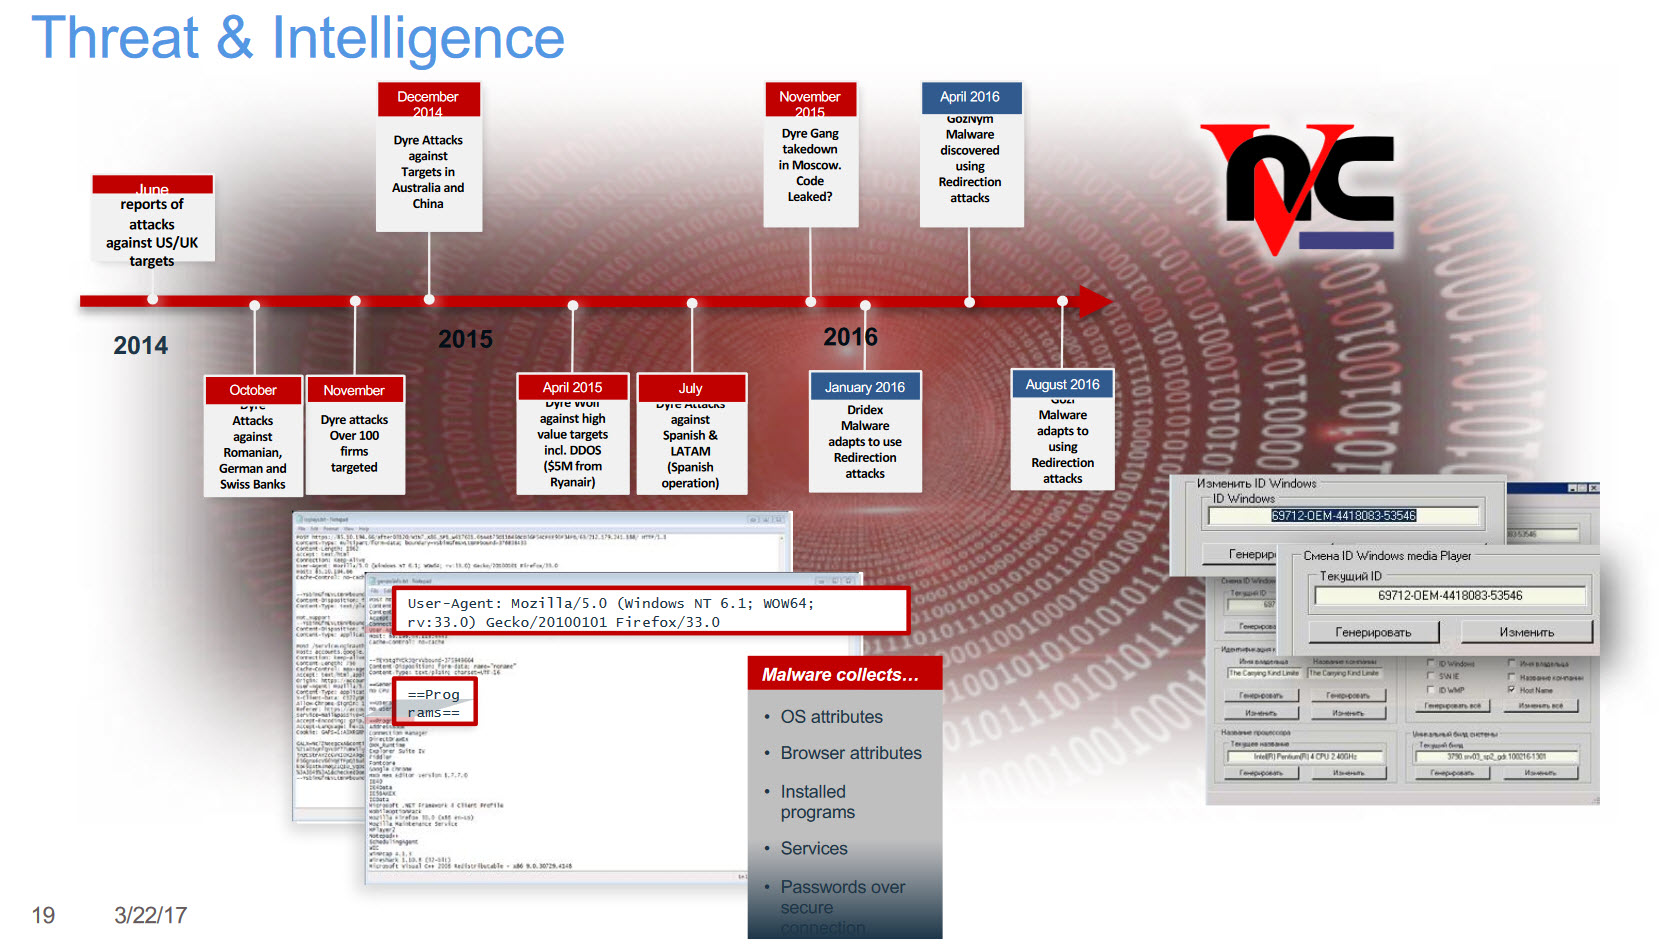 IBM InterConnect 2017 Trusteer Digital Transformation Banking Security threat intelligence